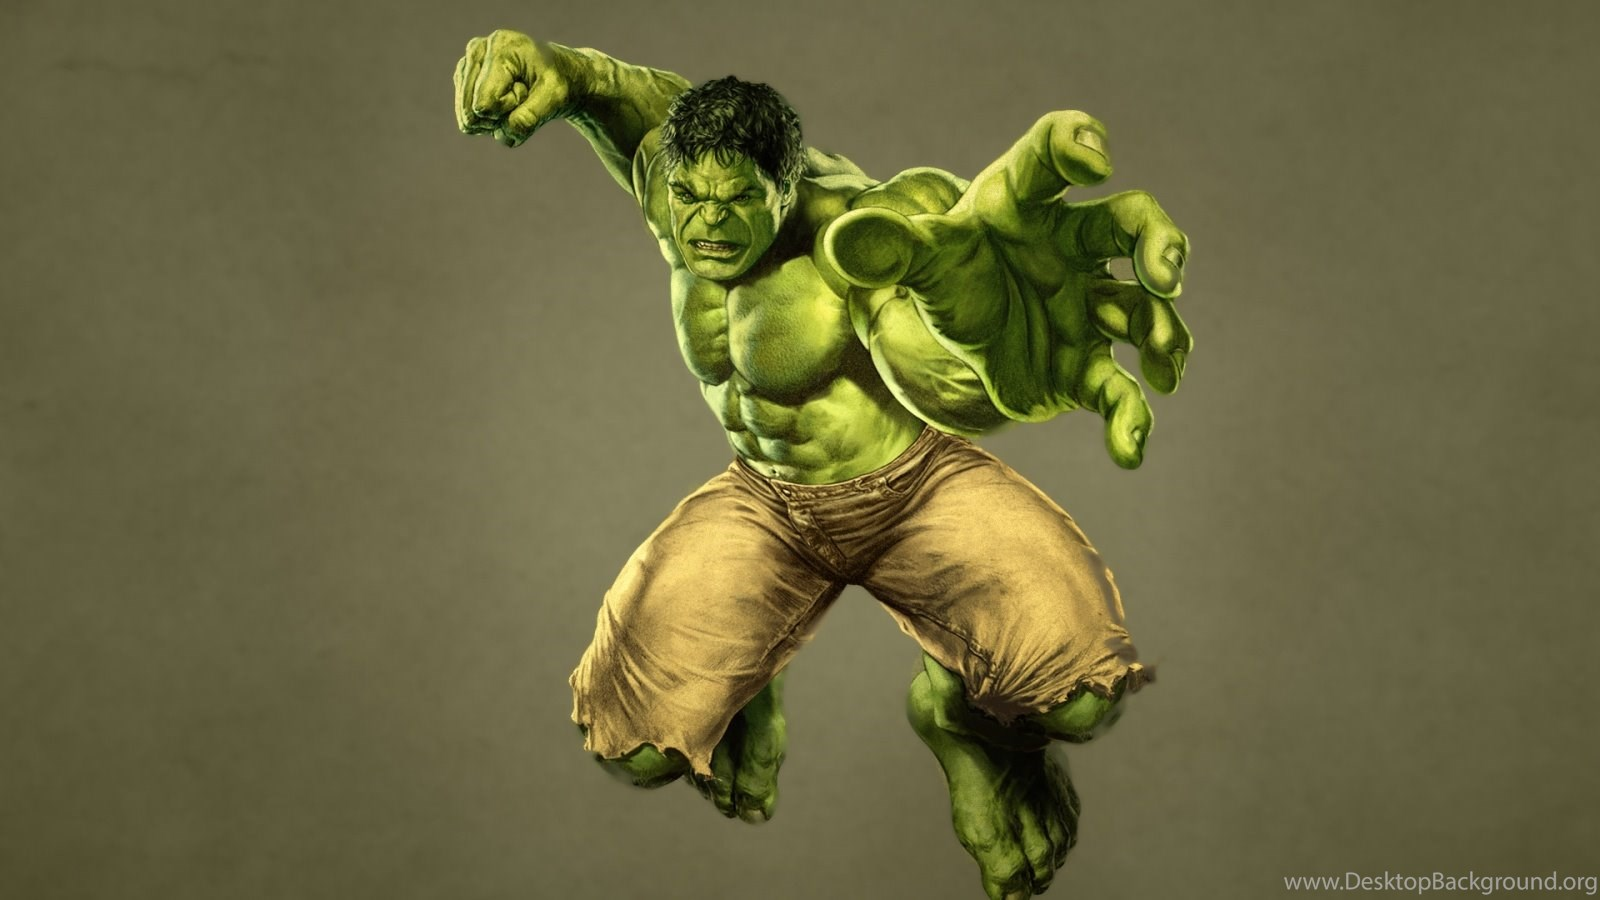 1600x900 Incredible Hulk Wallpapers Desktop Background